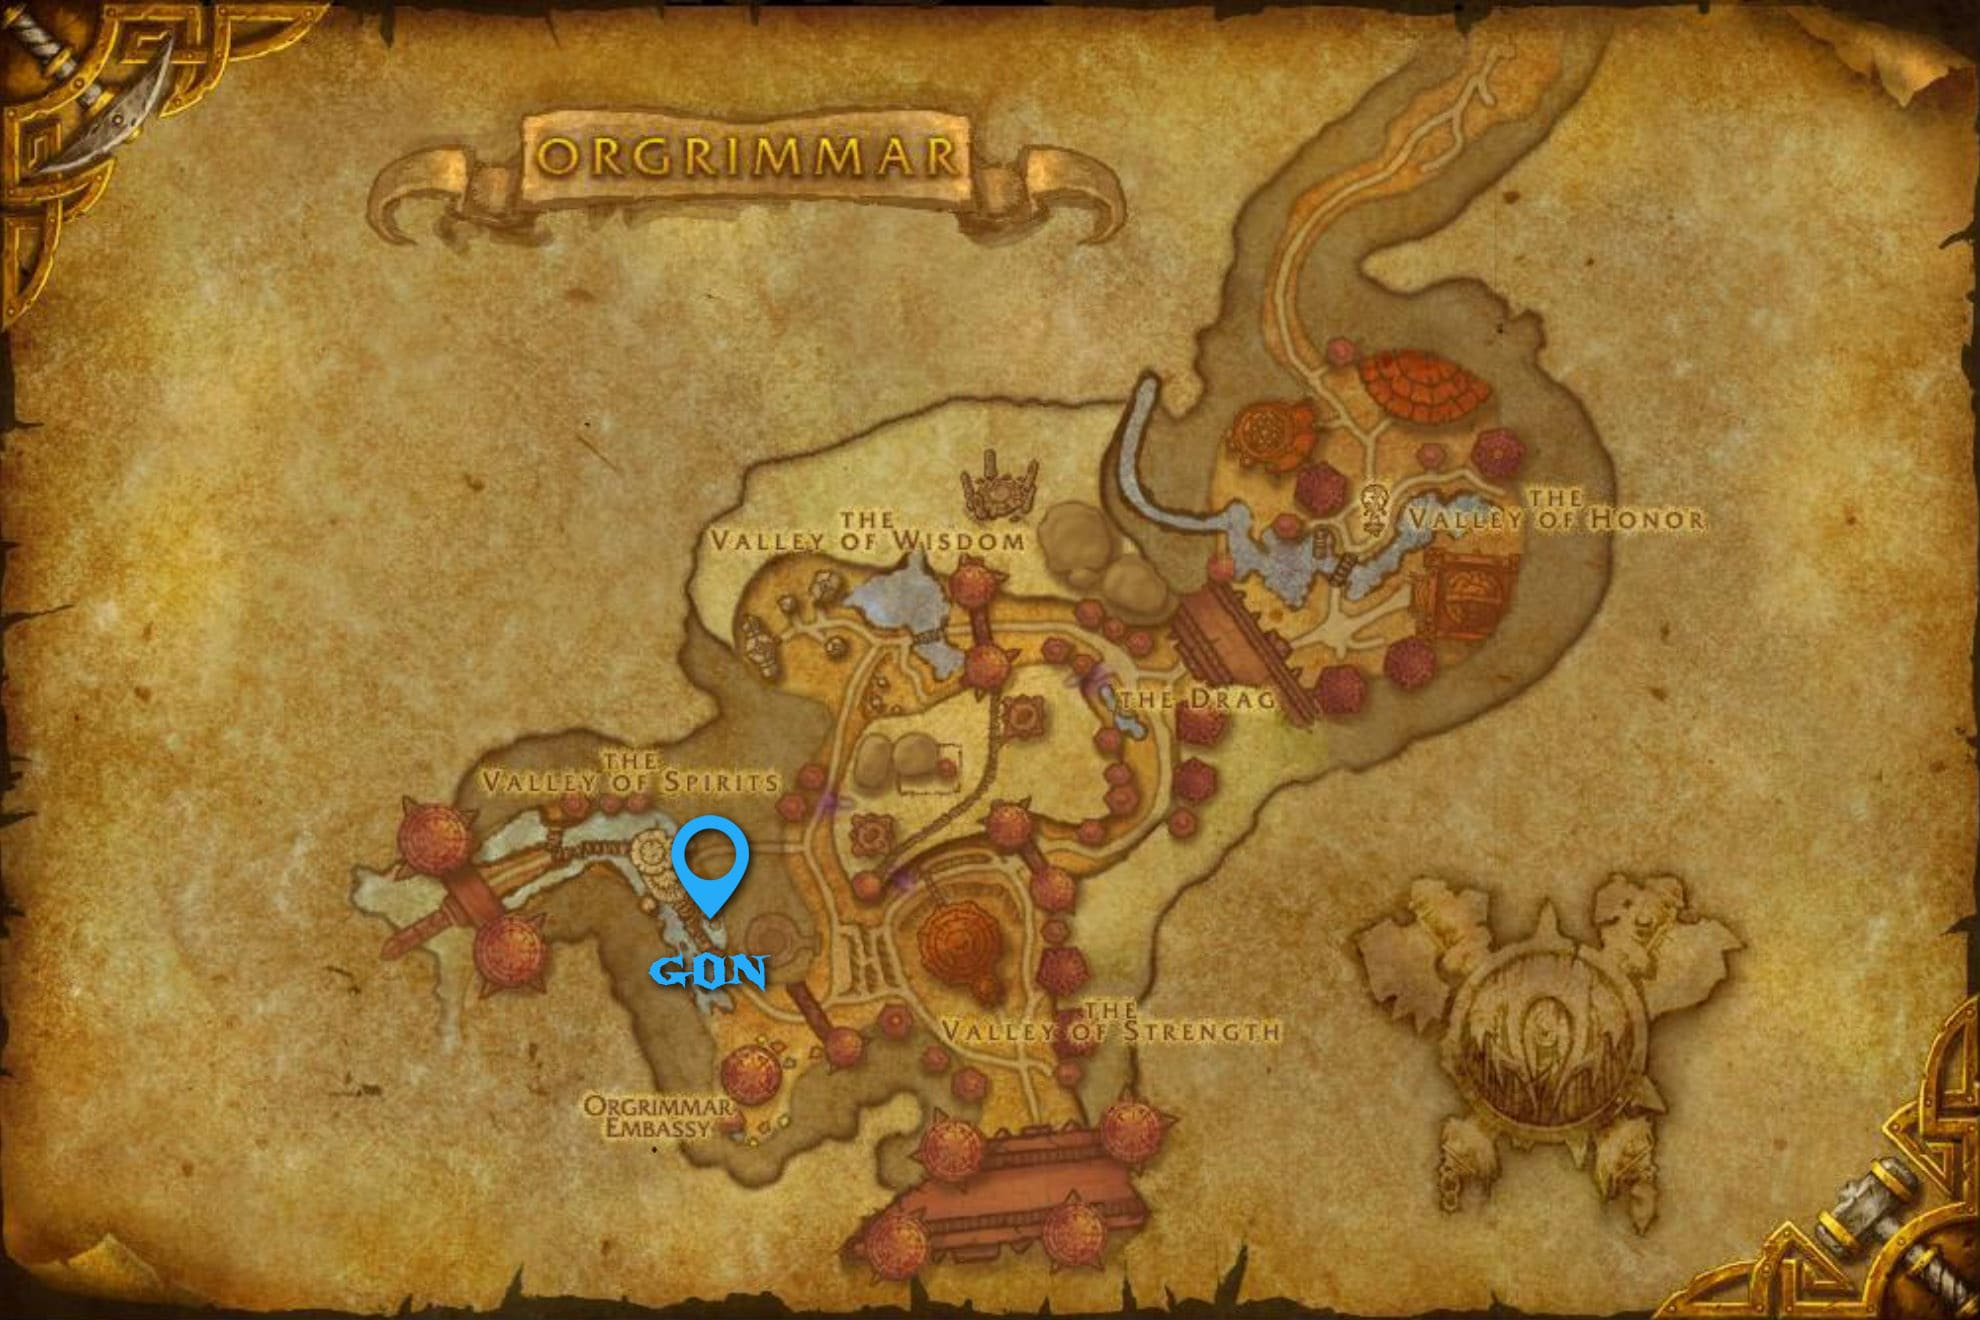 Gon Spirit Beast Spawn Location in Orgrimmar